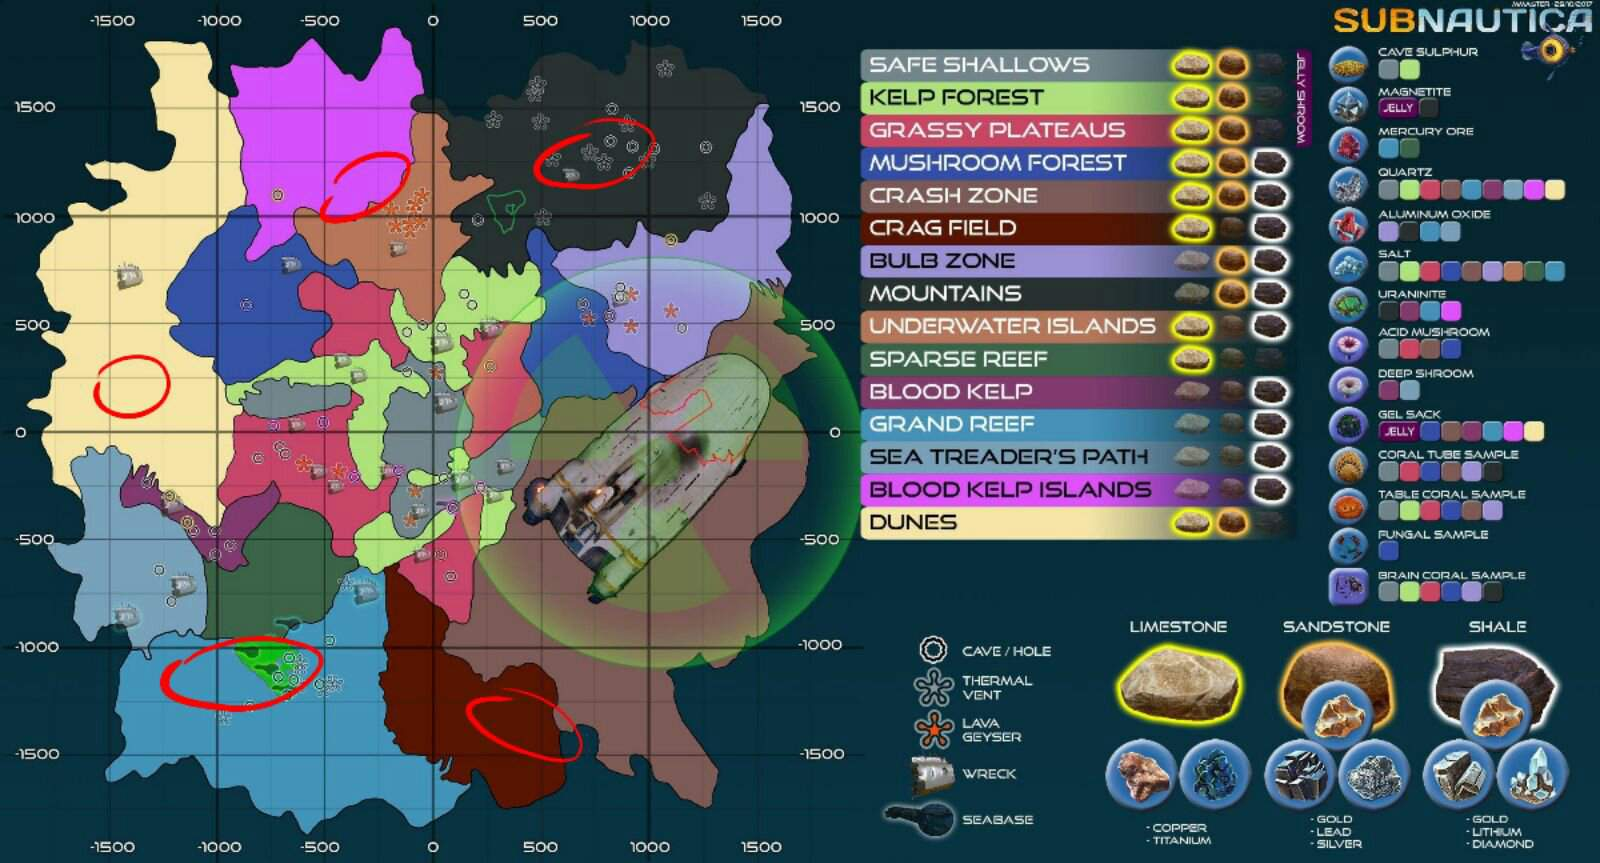 Life Pod Subnautica Locations Map